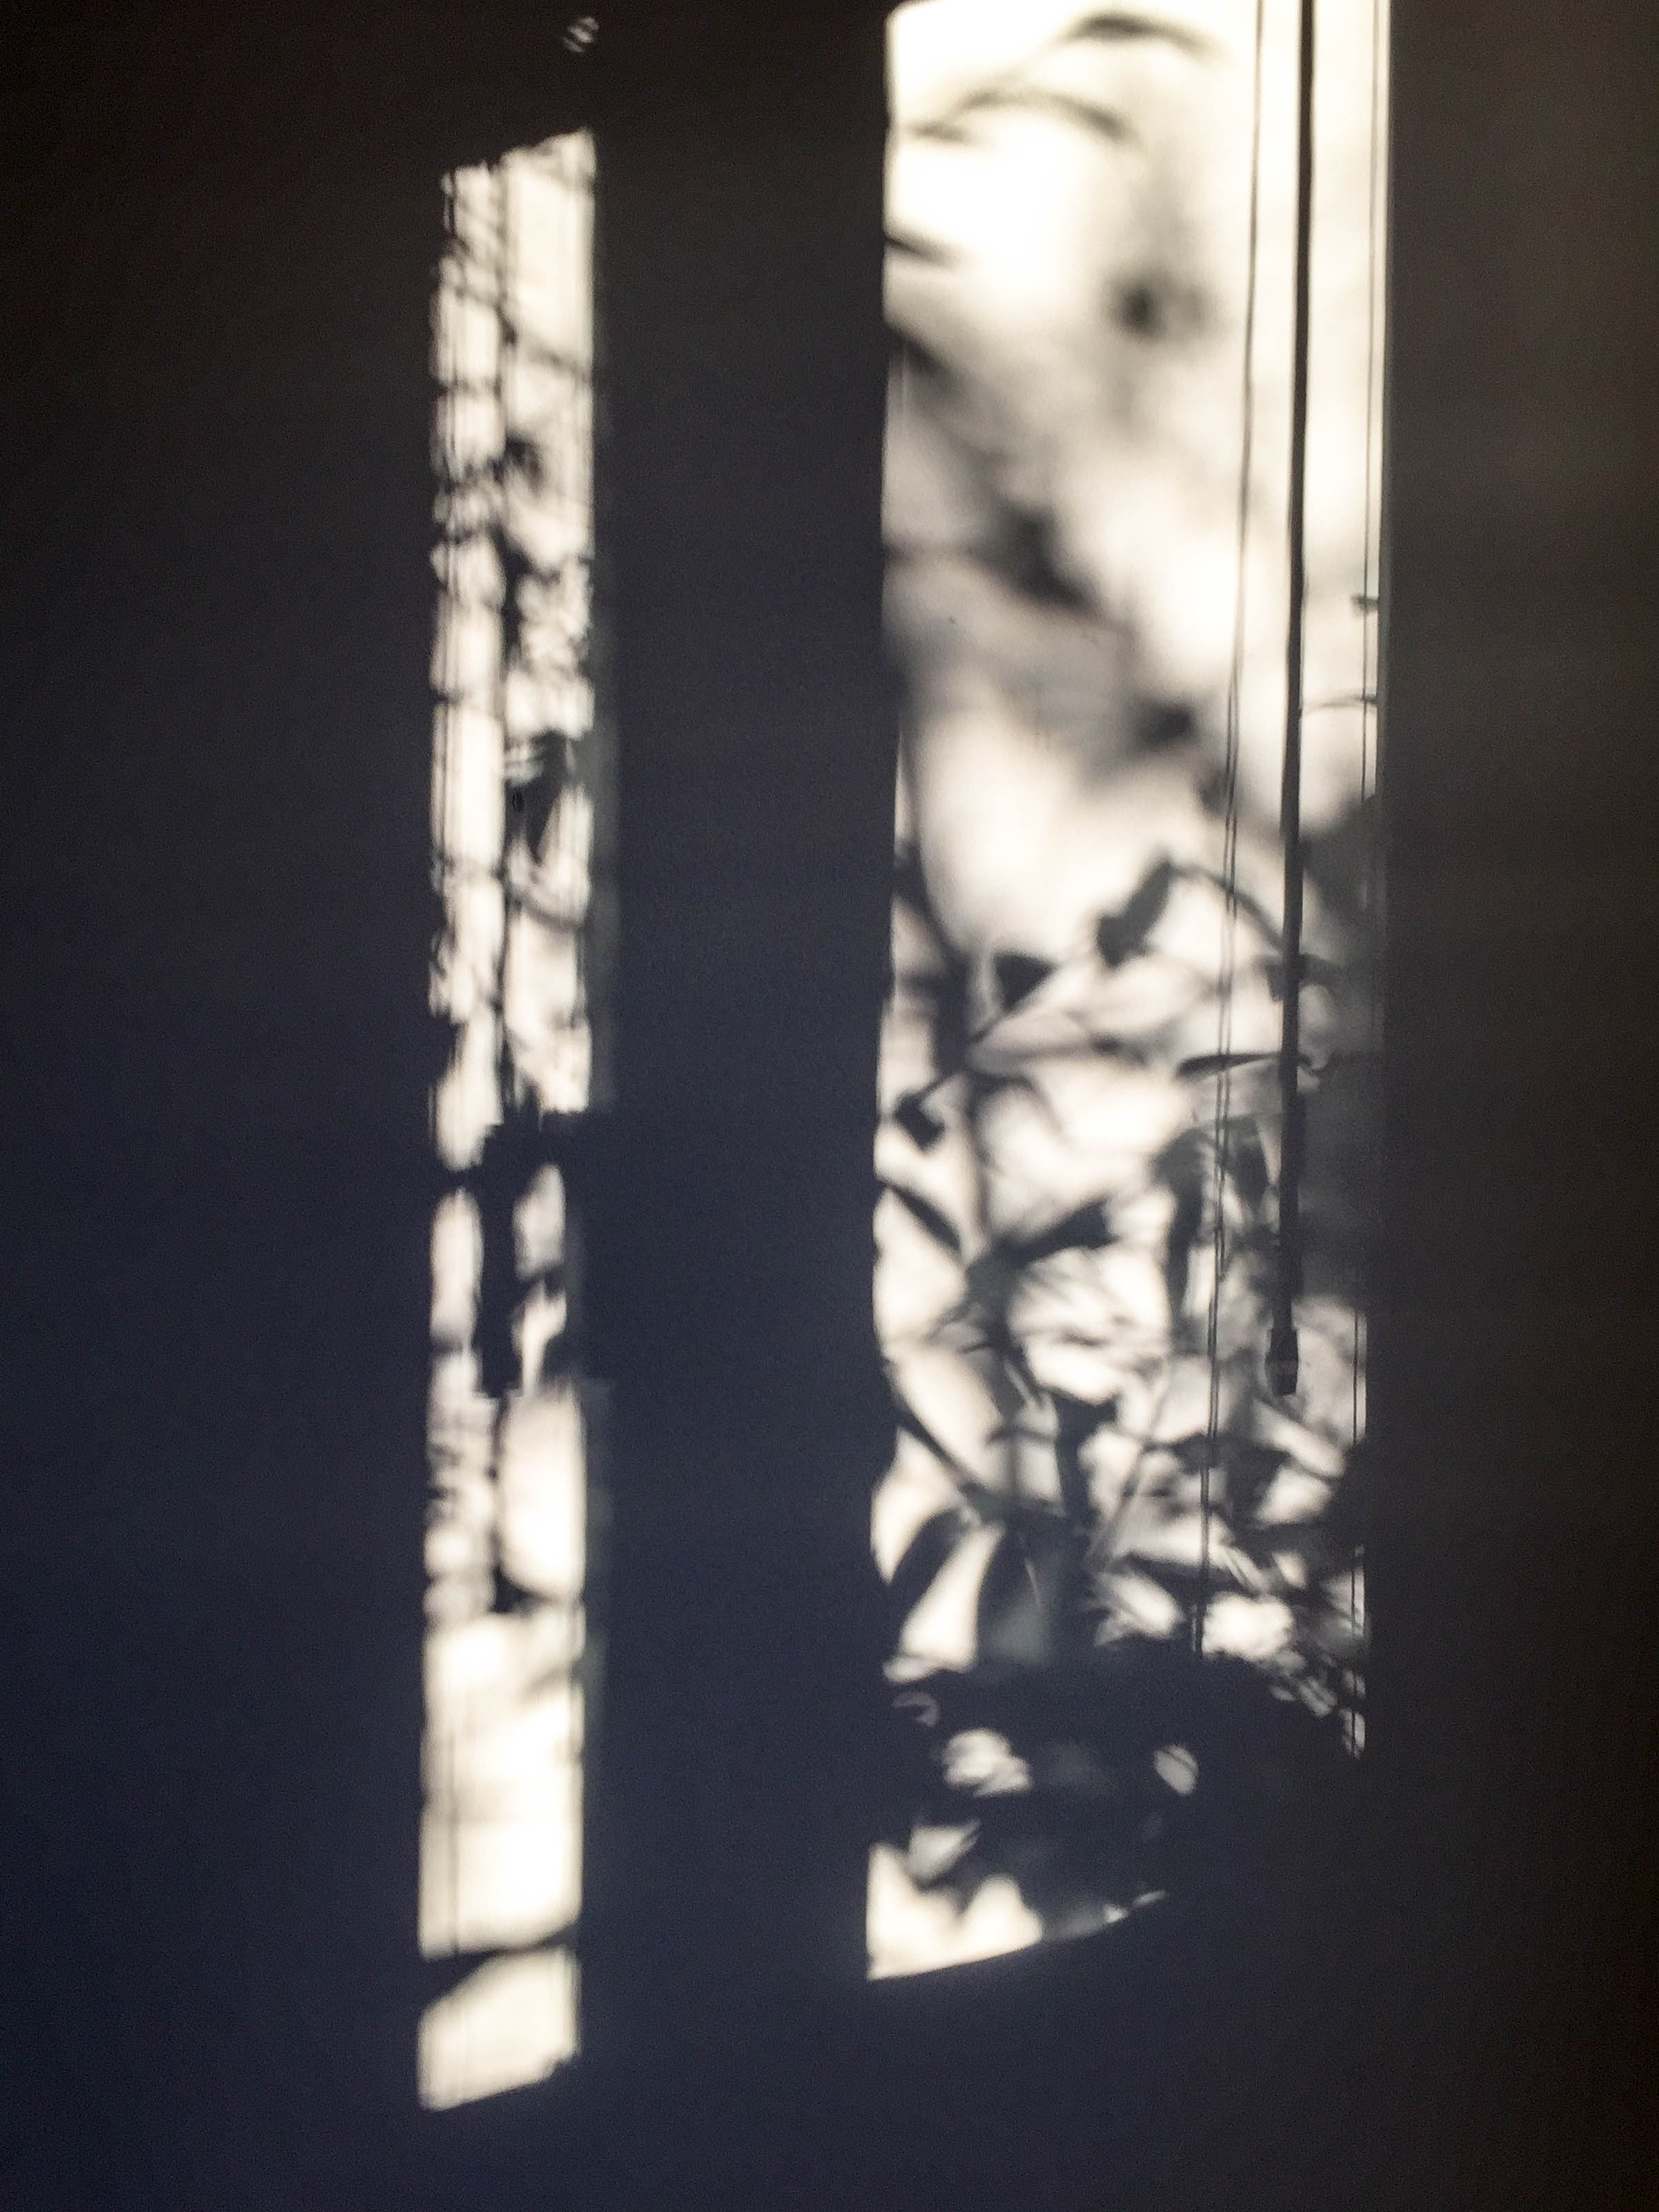 Schattenspiele im Büro